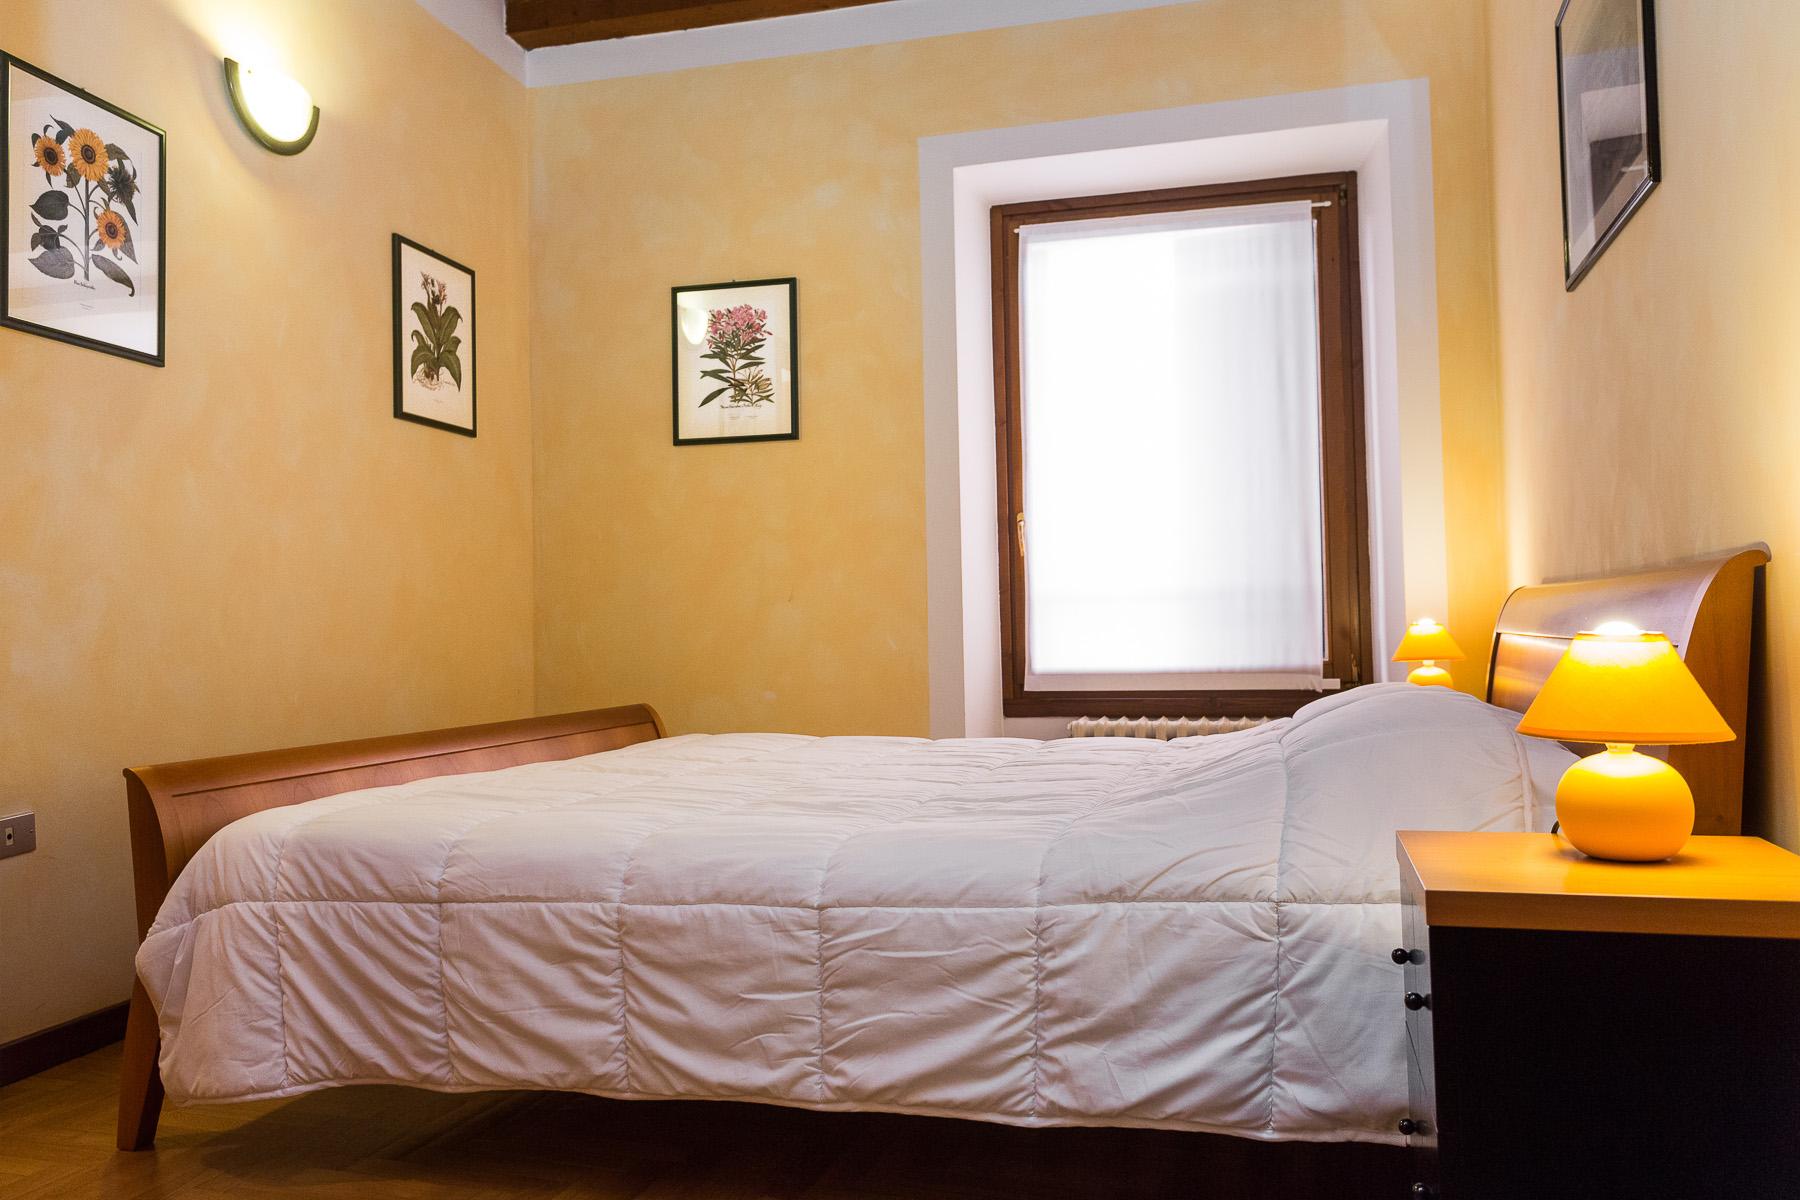 Dimora Forti 2 - Verona Holiday Rentals